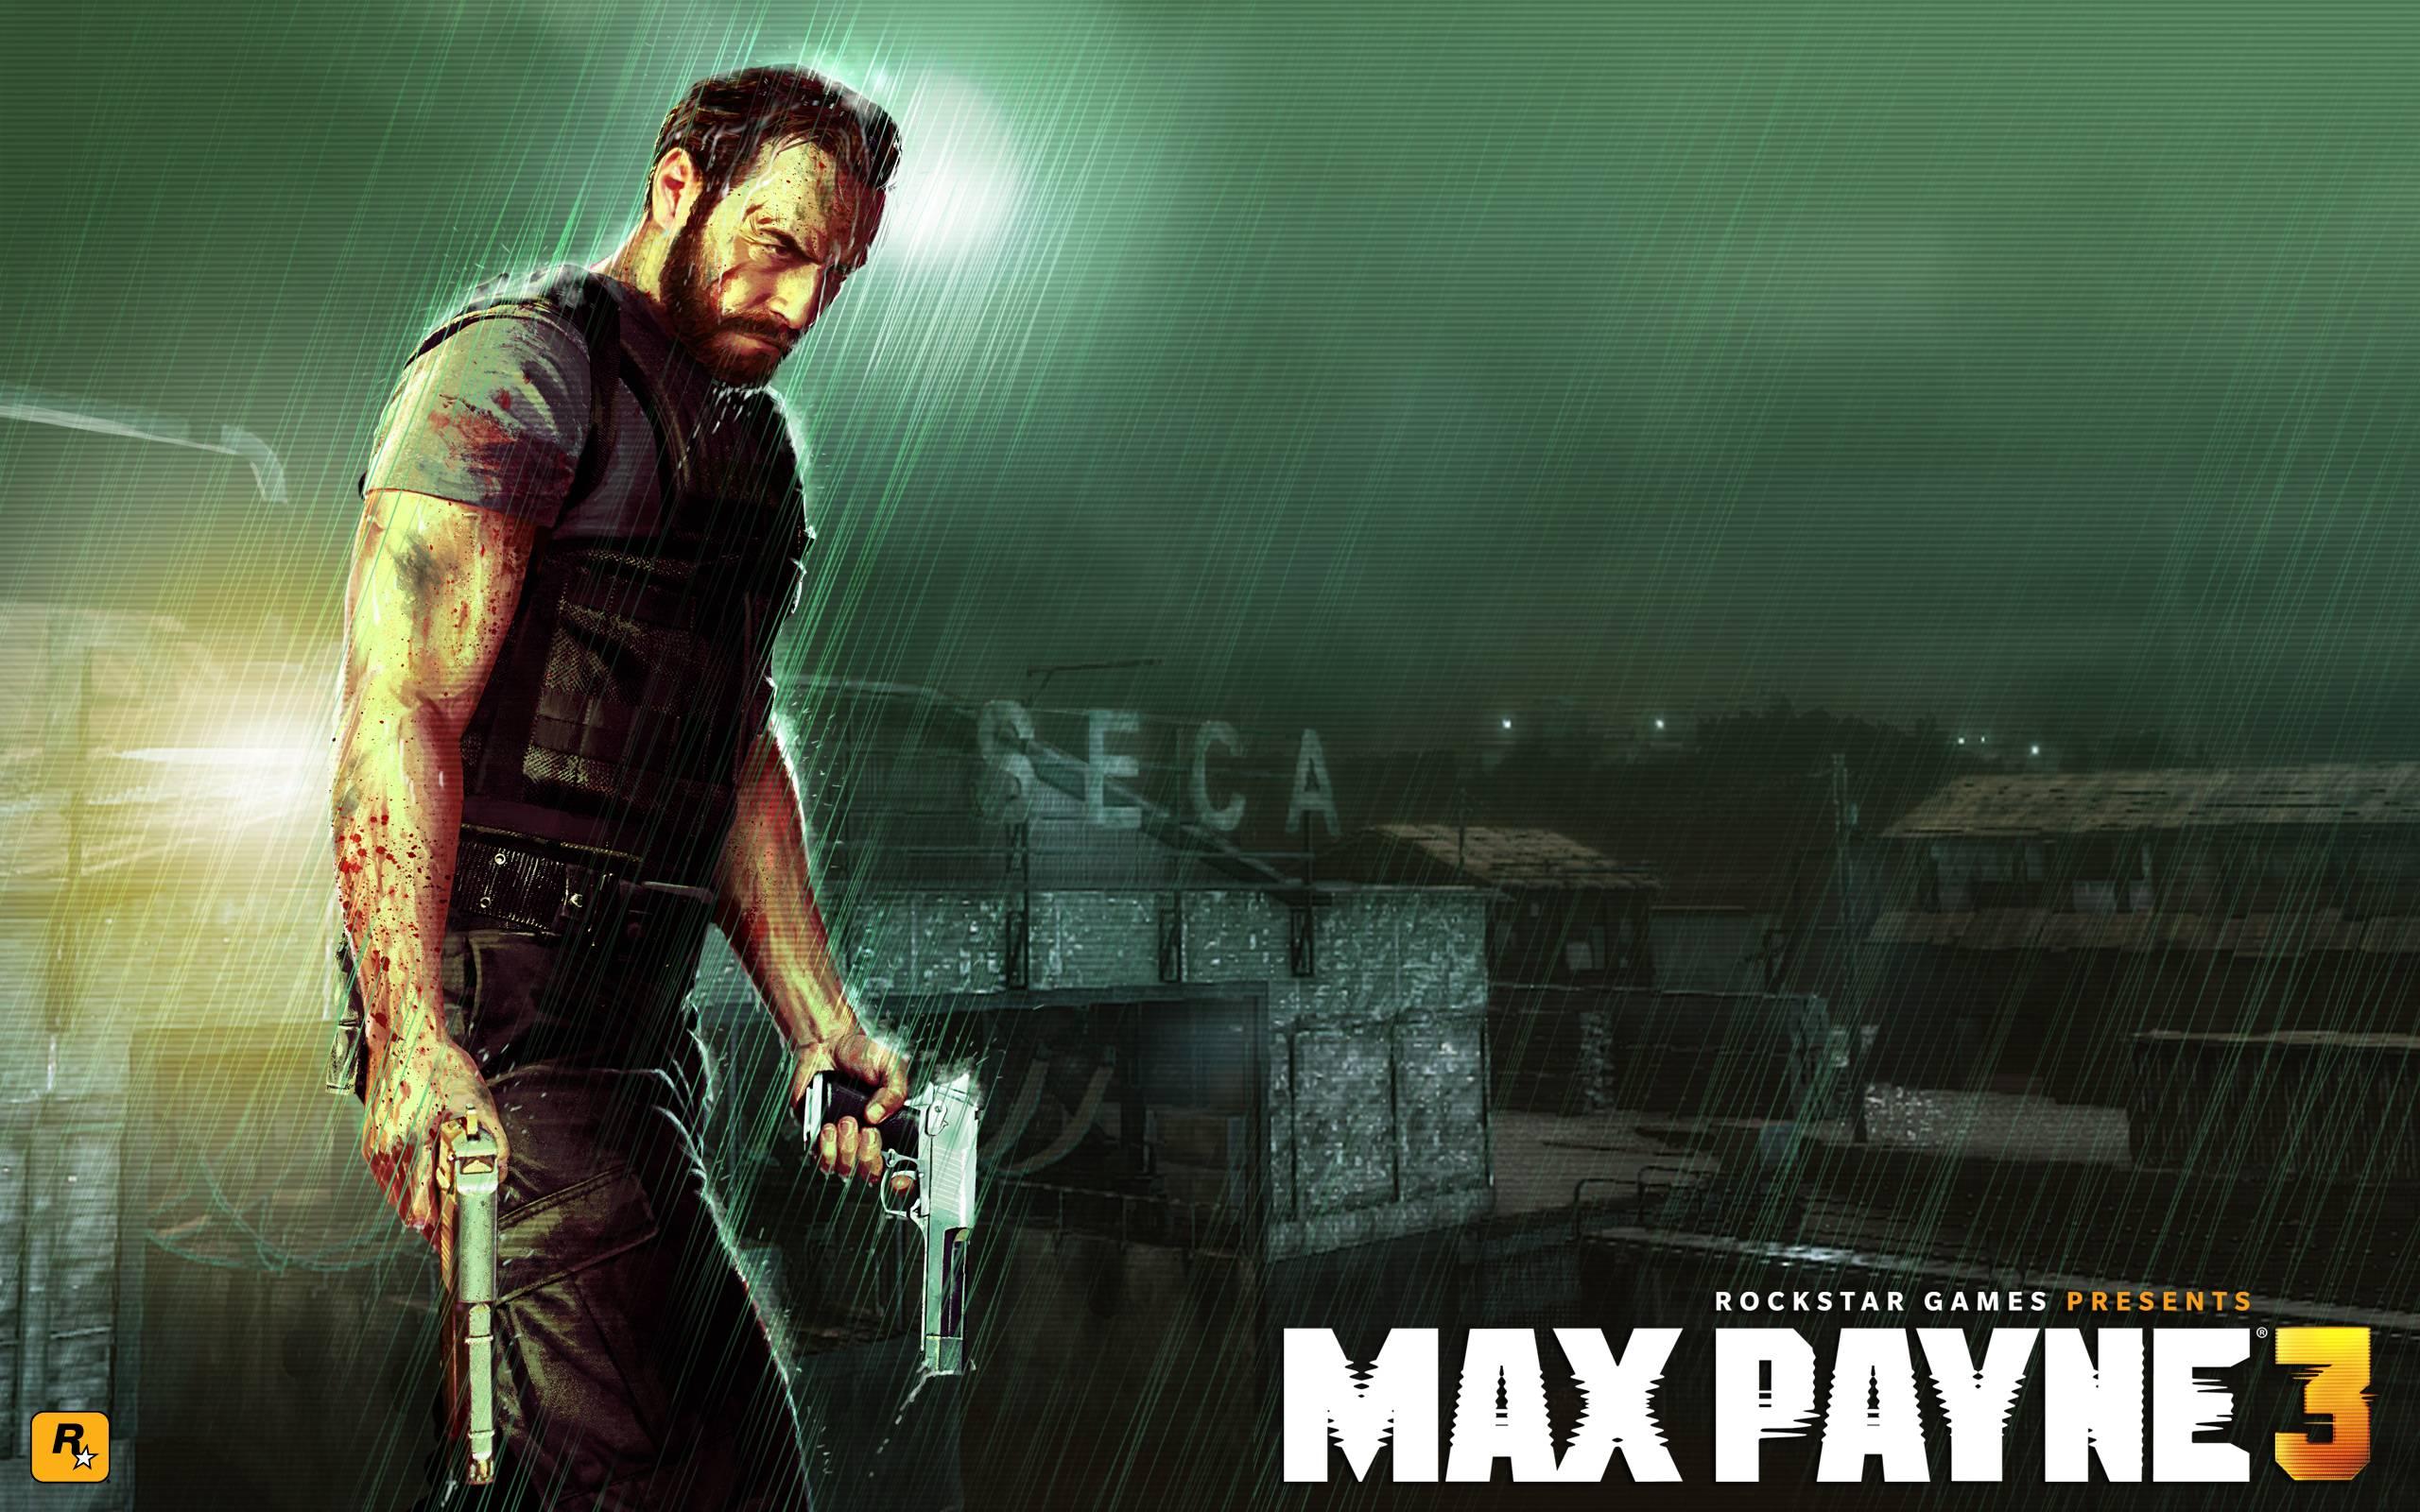 max payne 3 wallpaper live - photo #11